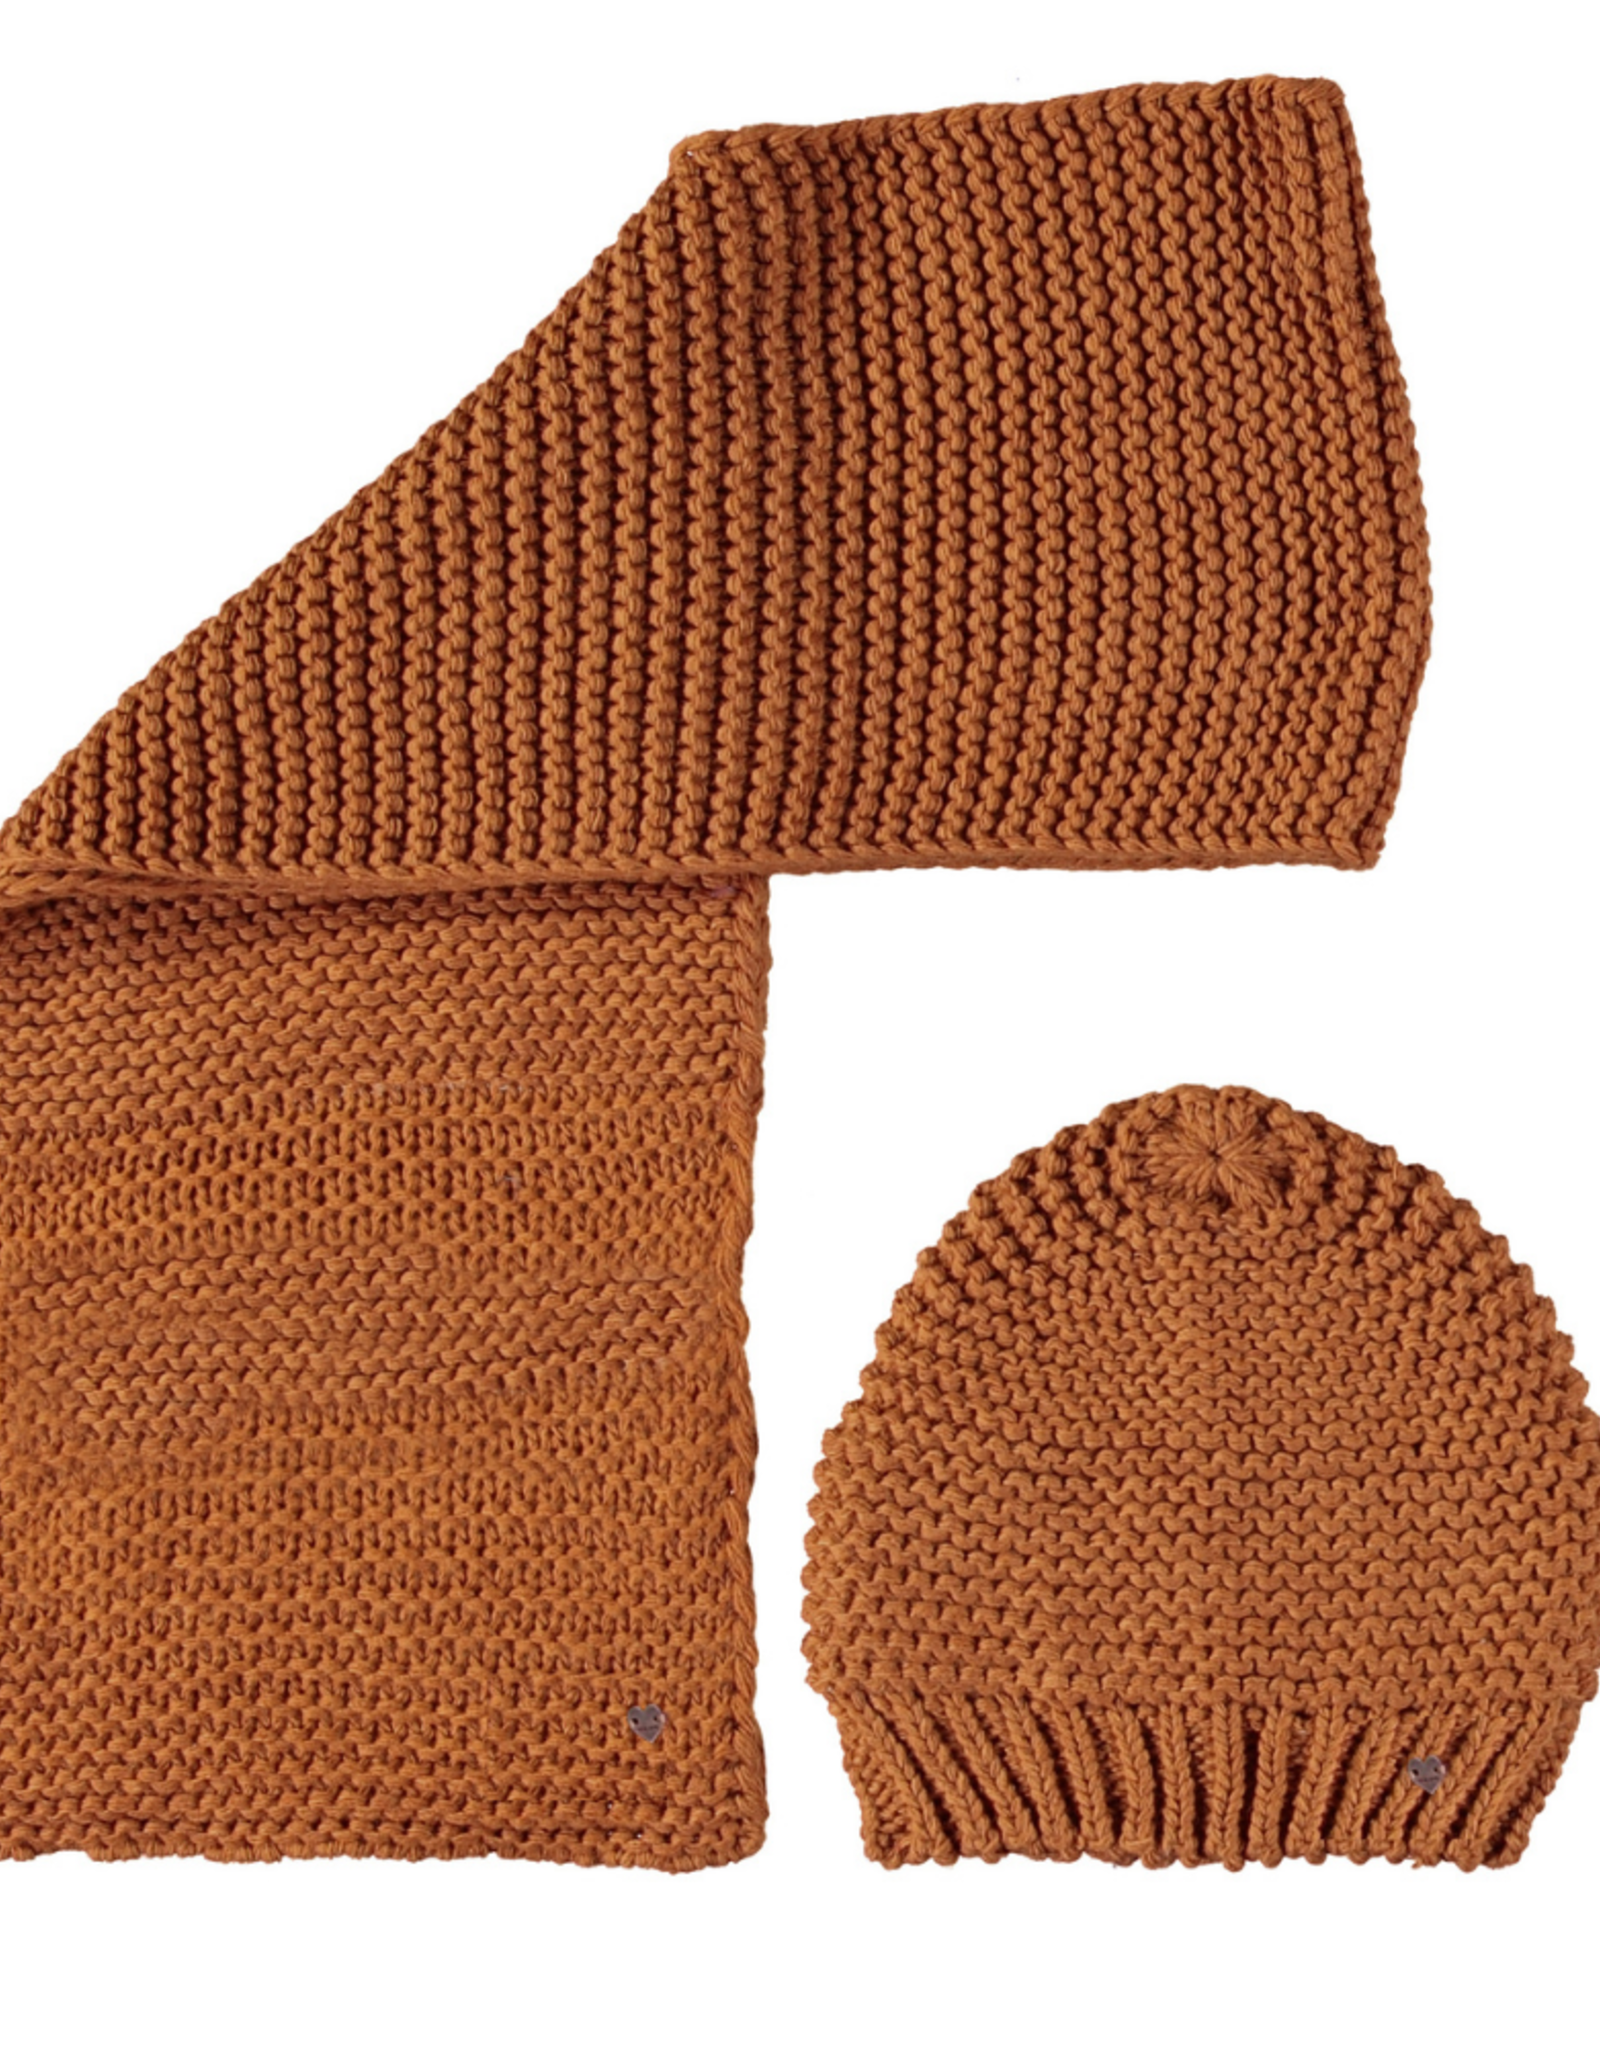 NONO NONO knitted scarf and hat 5900 chetsnut